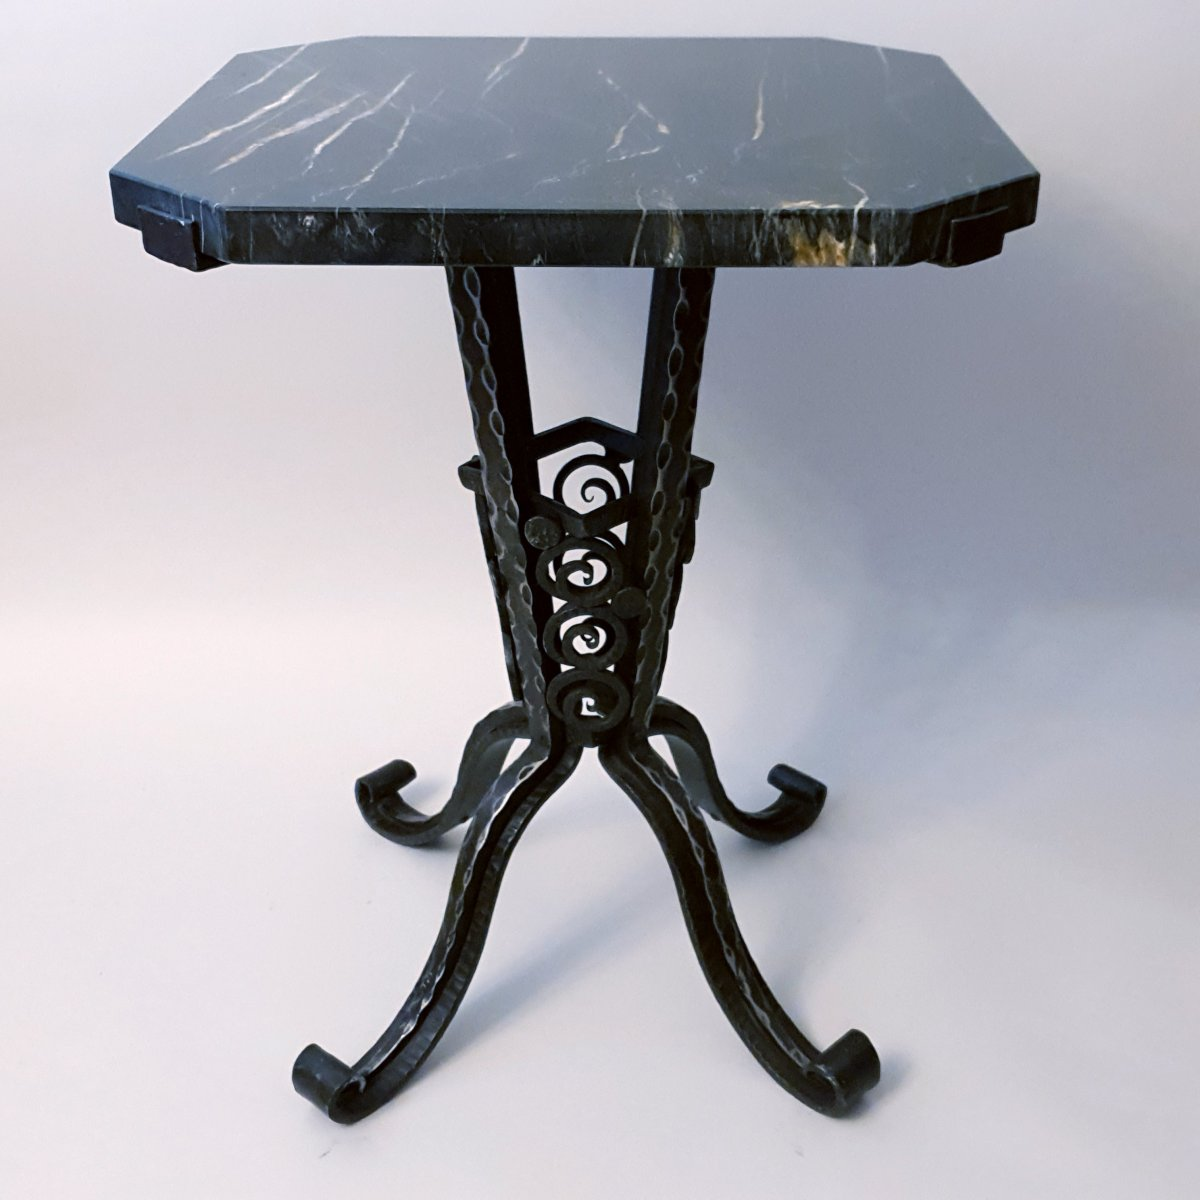 Art Deco Wrought Iron Table